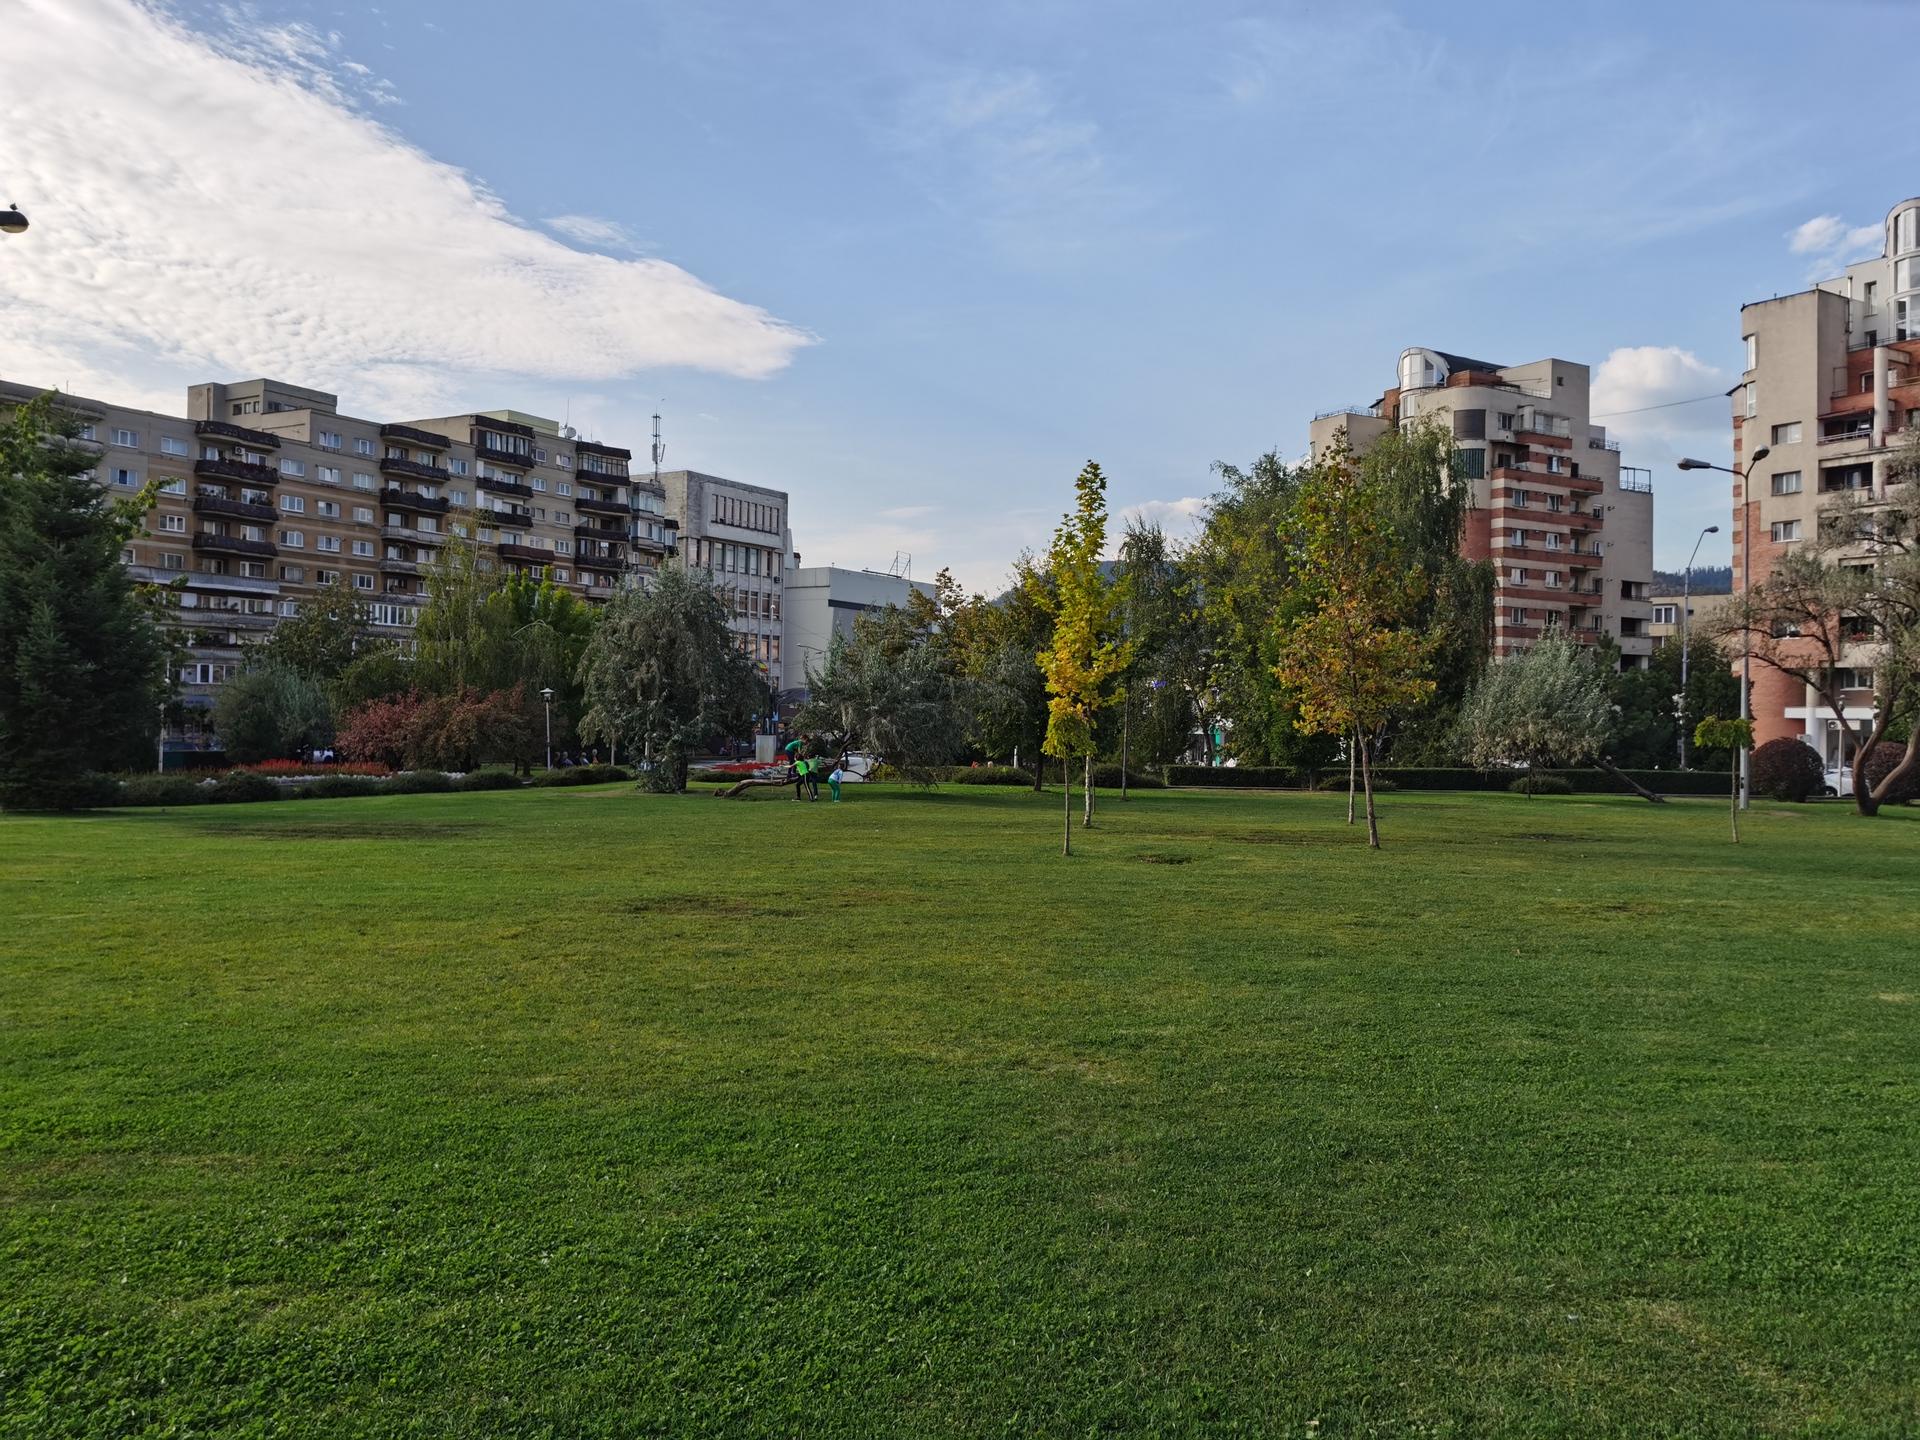 Huawei Mate 30 Pro Camera test Landcape shot of park in sunlight